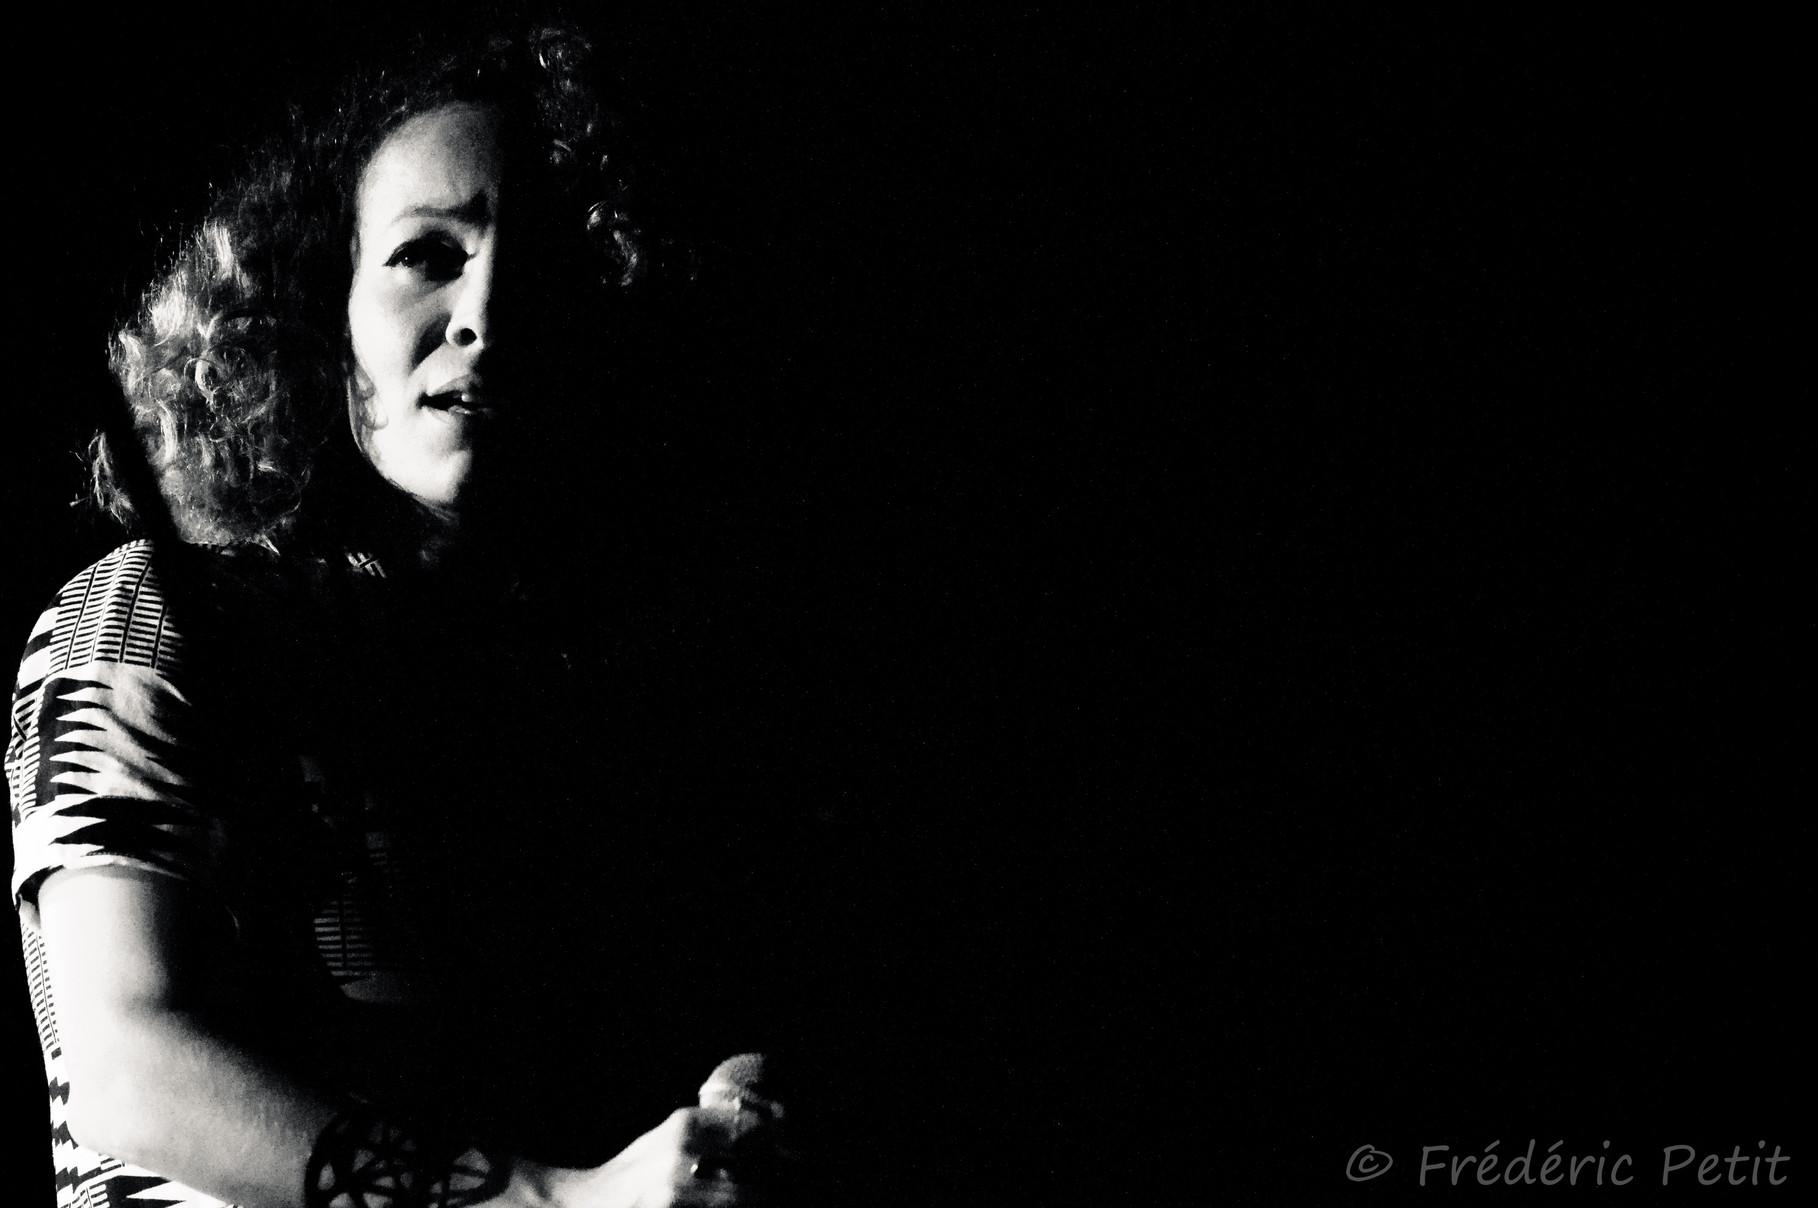 21 octobre 2013 - Élodie Rama @ 3 Baudets